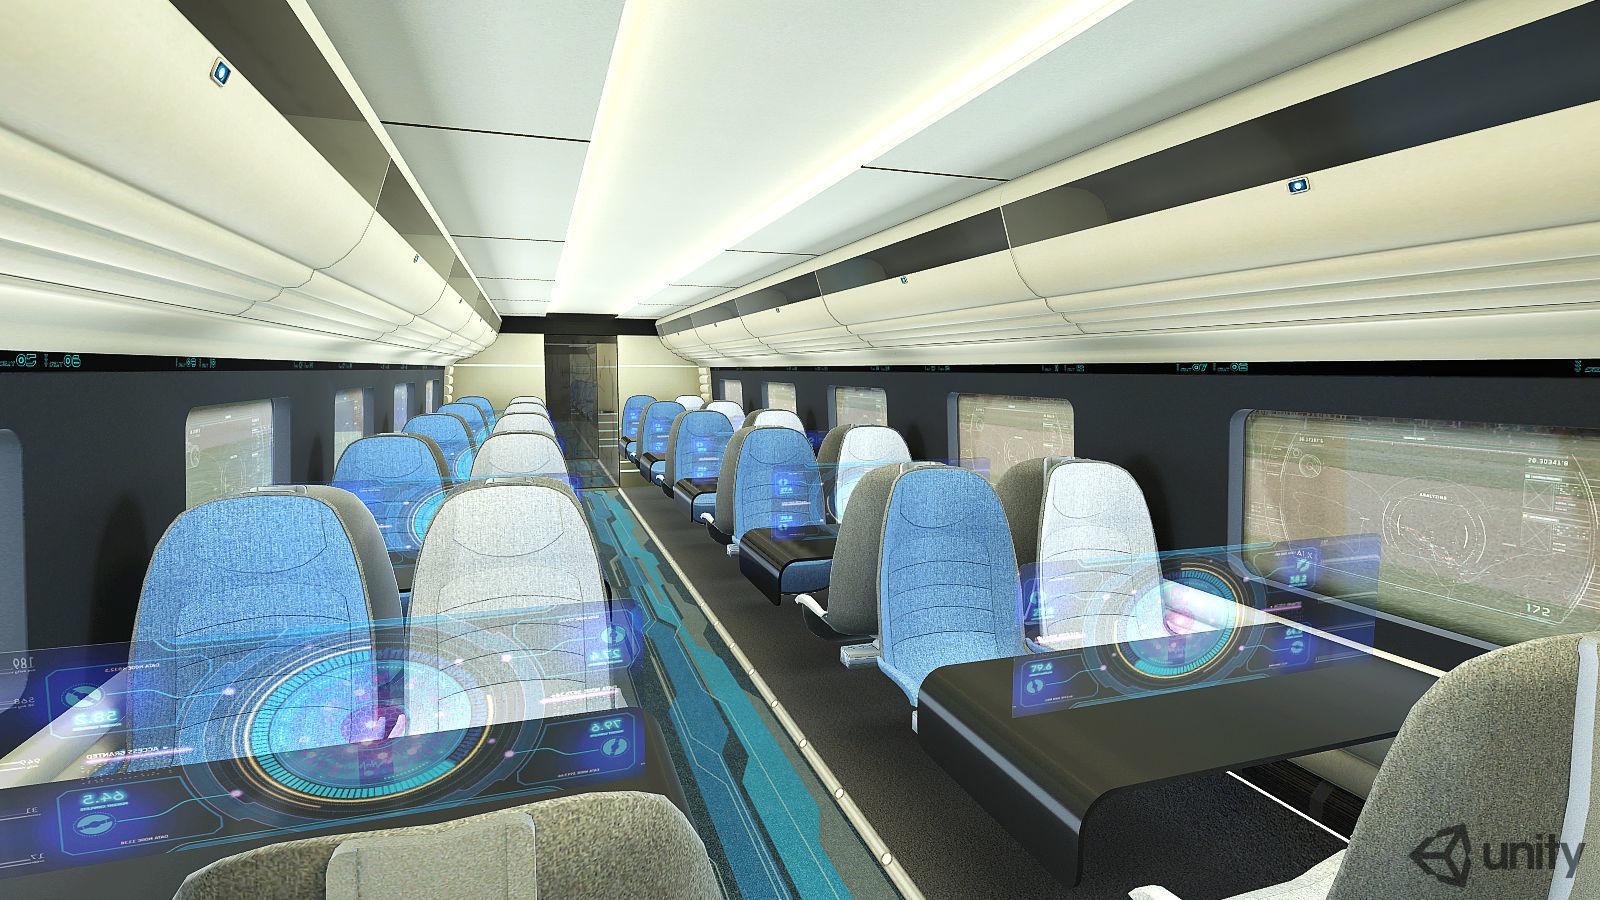 Train Interior VR AR Game Ready | 3D model